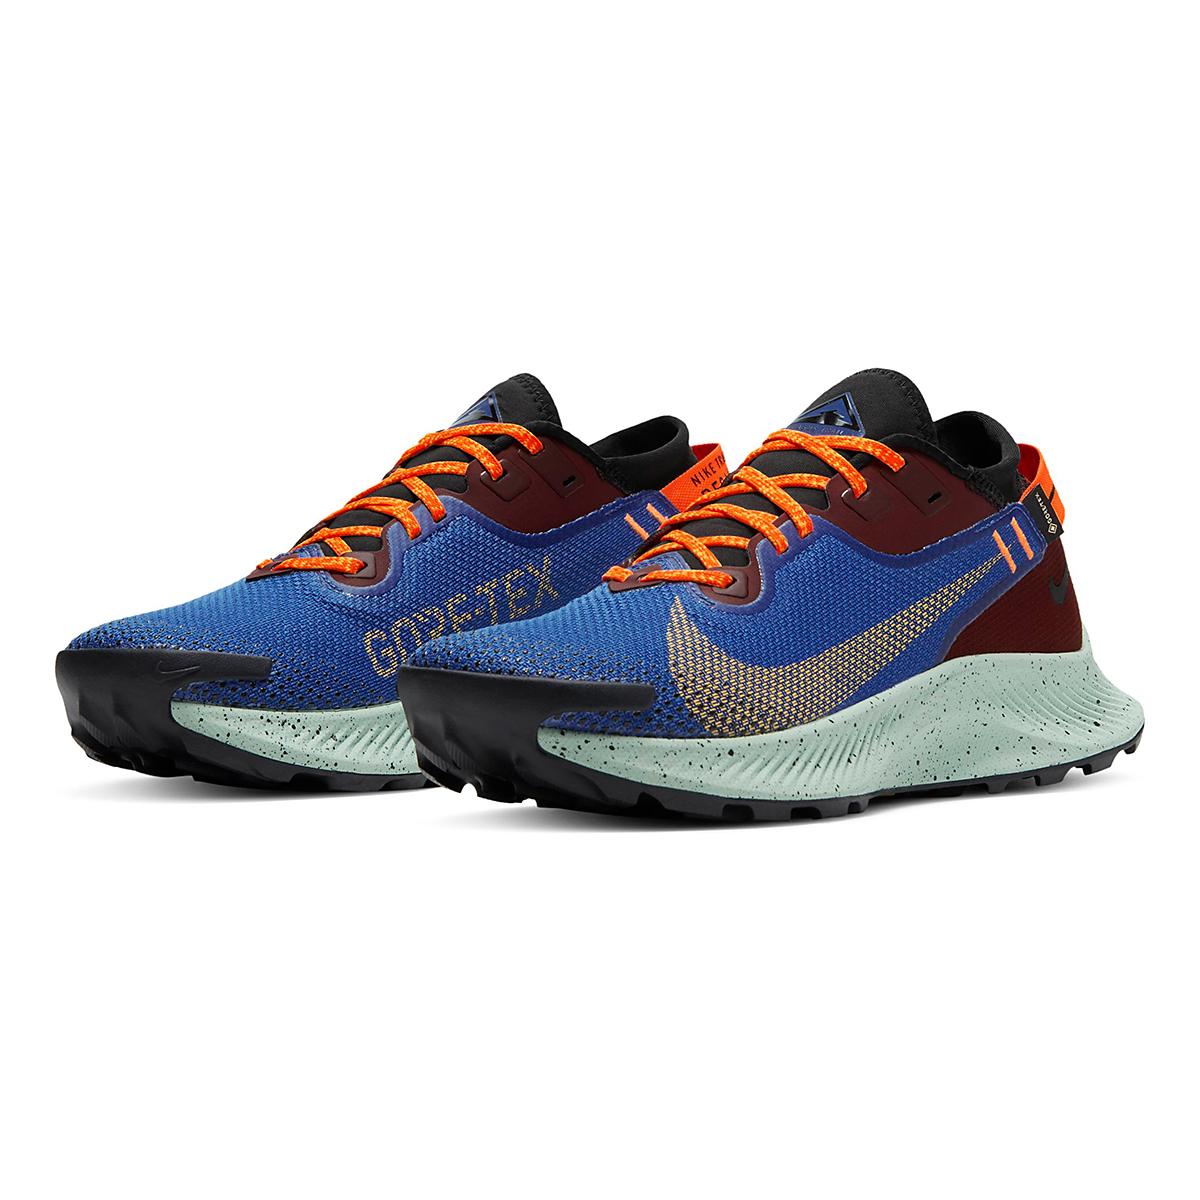 Women's Nike Pegasus Trail 2 Gore-Tex Trail Running Shoe - Color: Mystic Dates/Laser Orange/ Astronomy Blue - Size: 5 - Width: Regular, Mystic Dates/Laser Orange/ Astronomy Blue, large, image 3